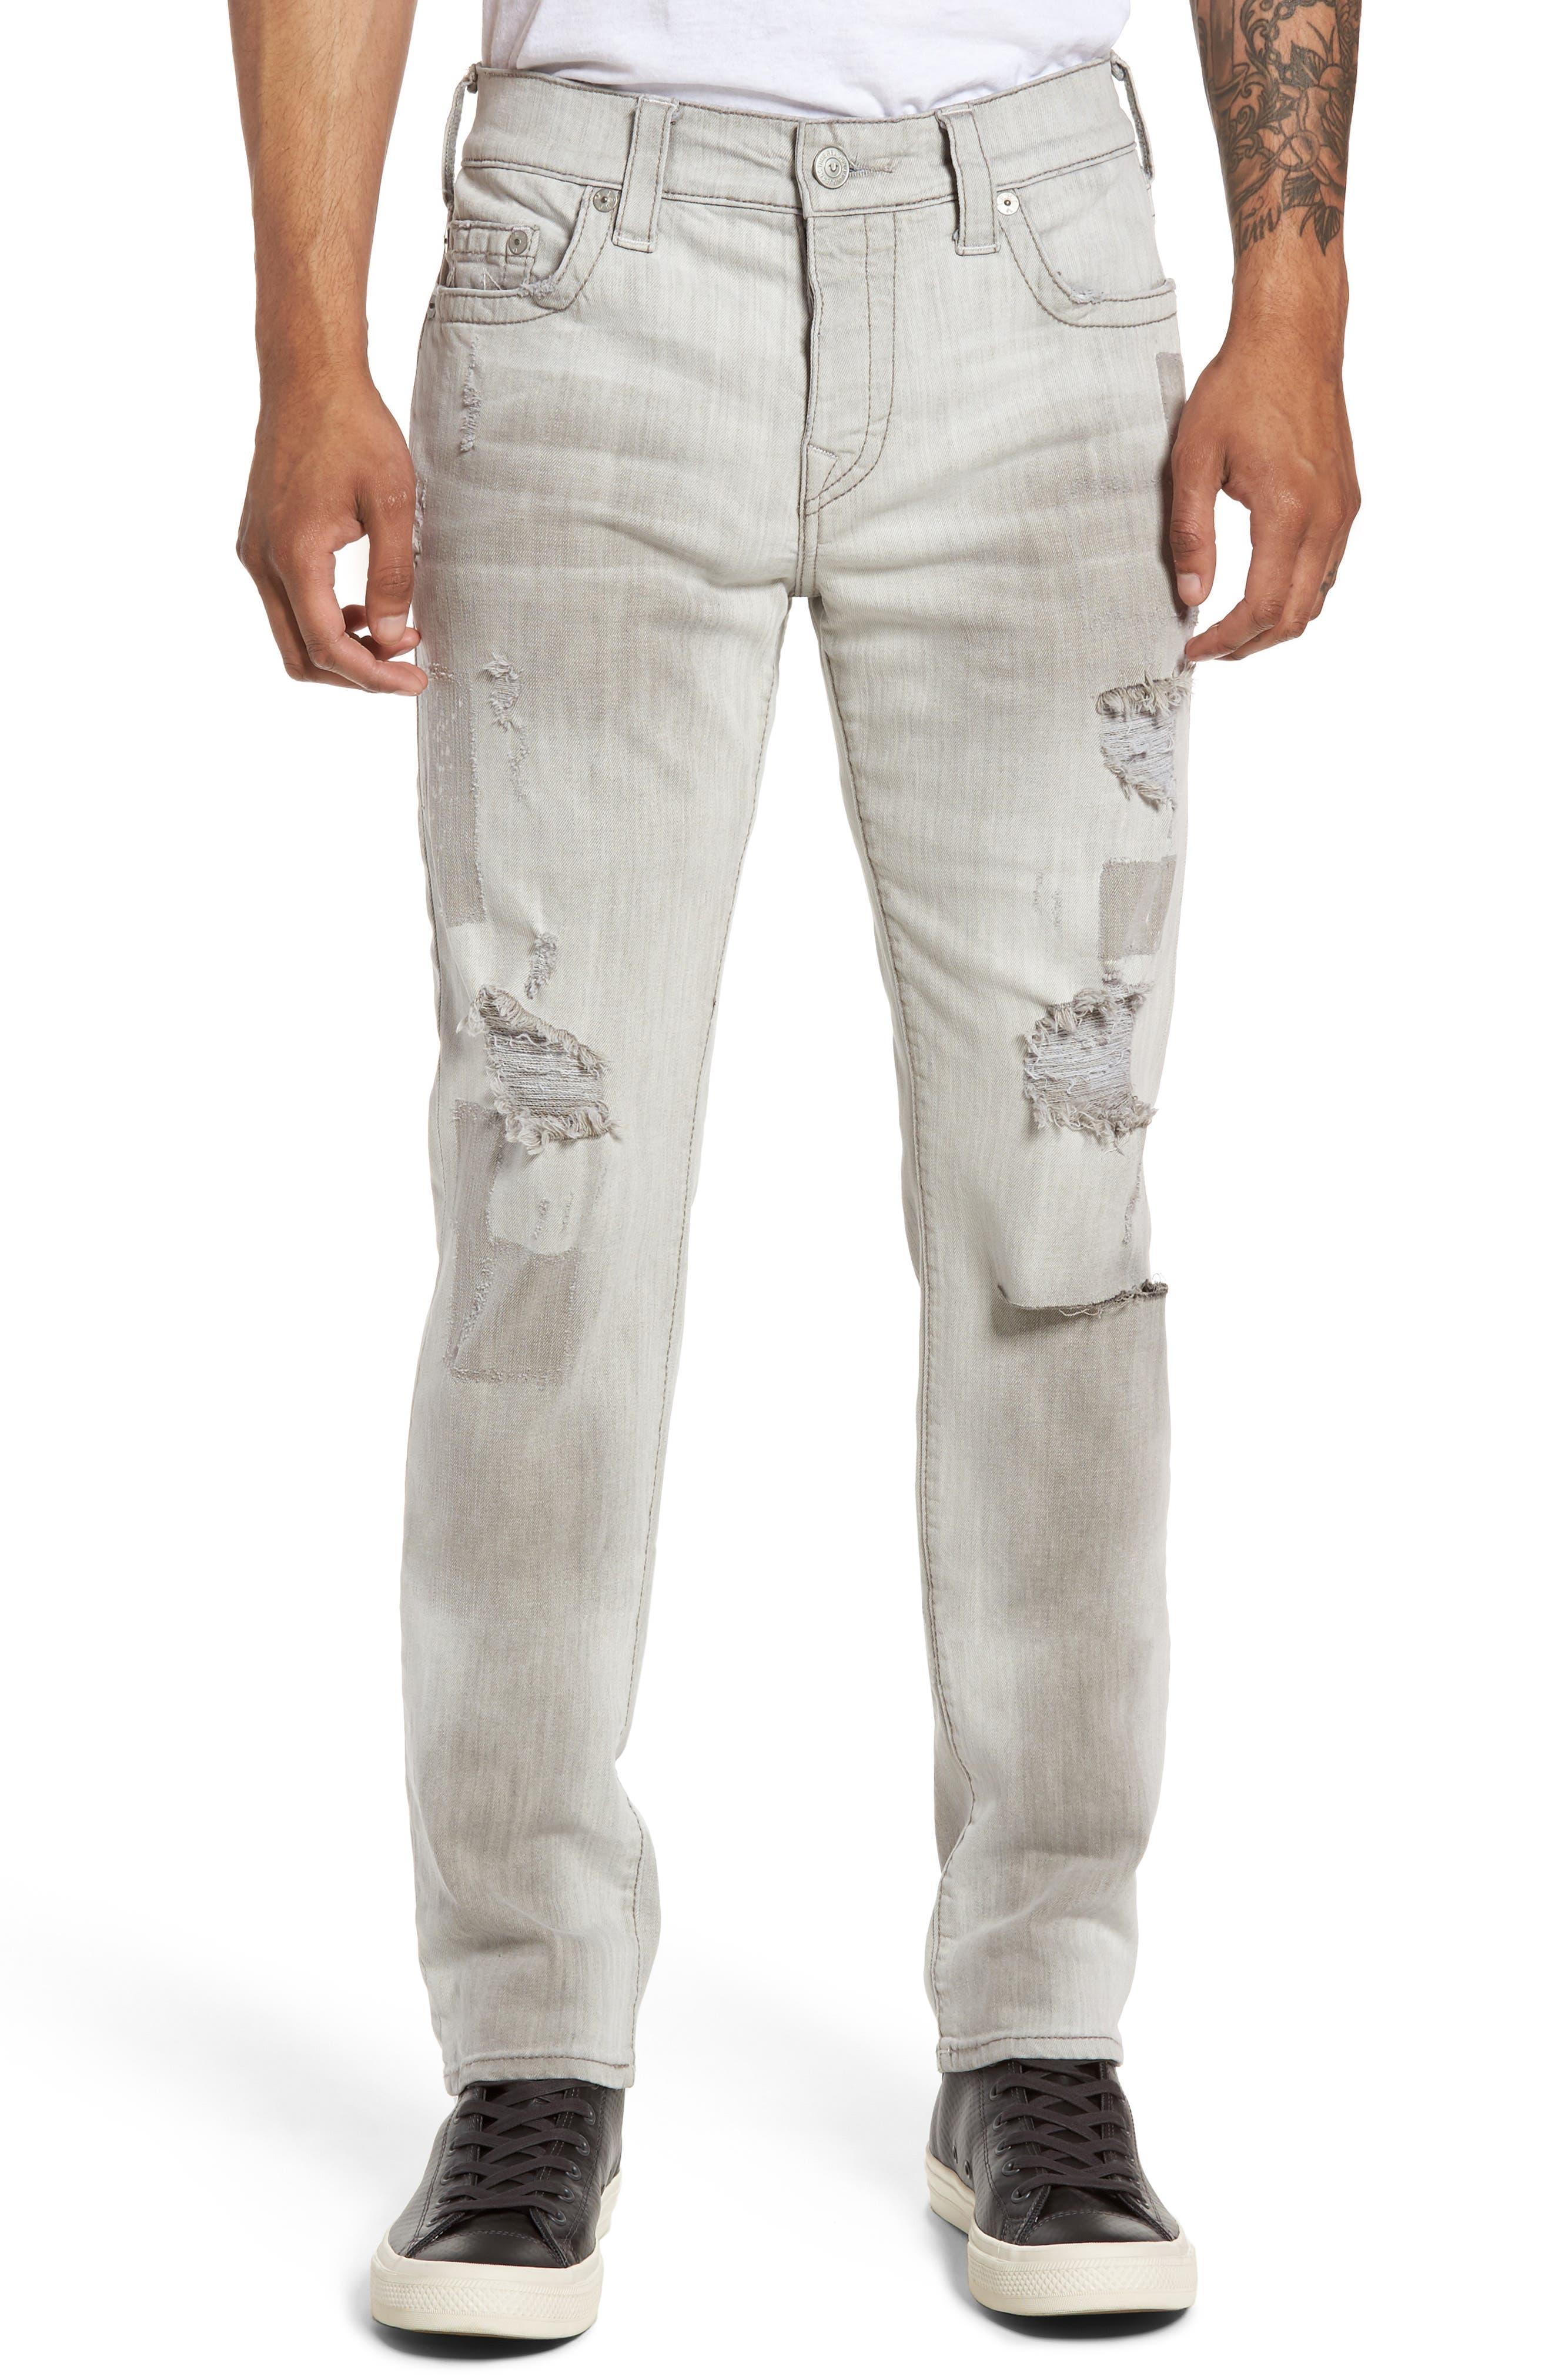 True Religion Brand Jeans Rocco Skinny Fit Jeans (Boardwalk Shadow)